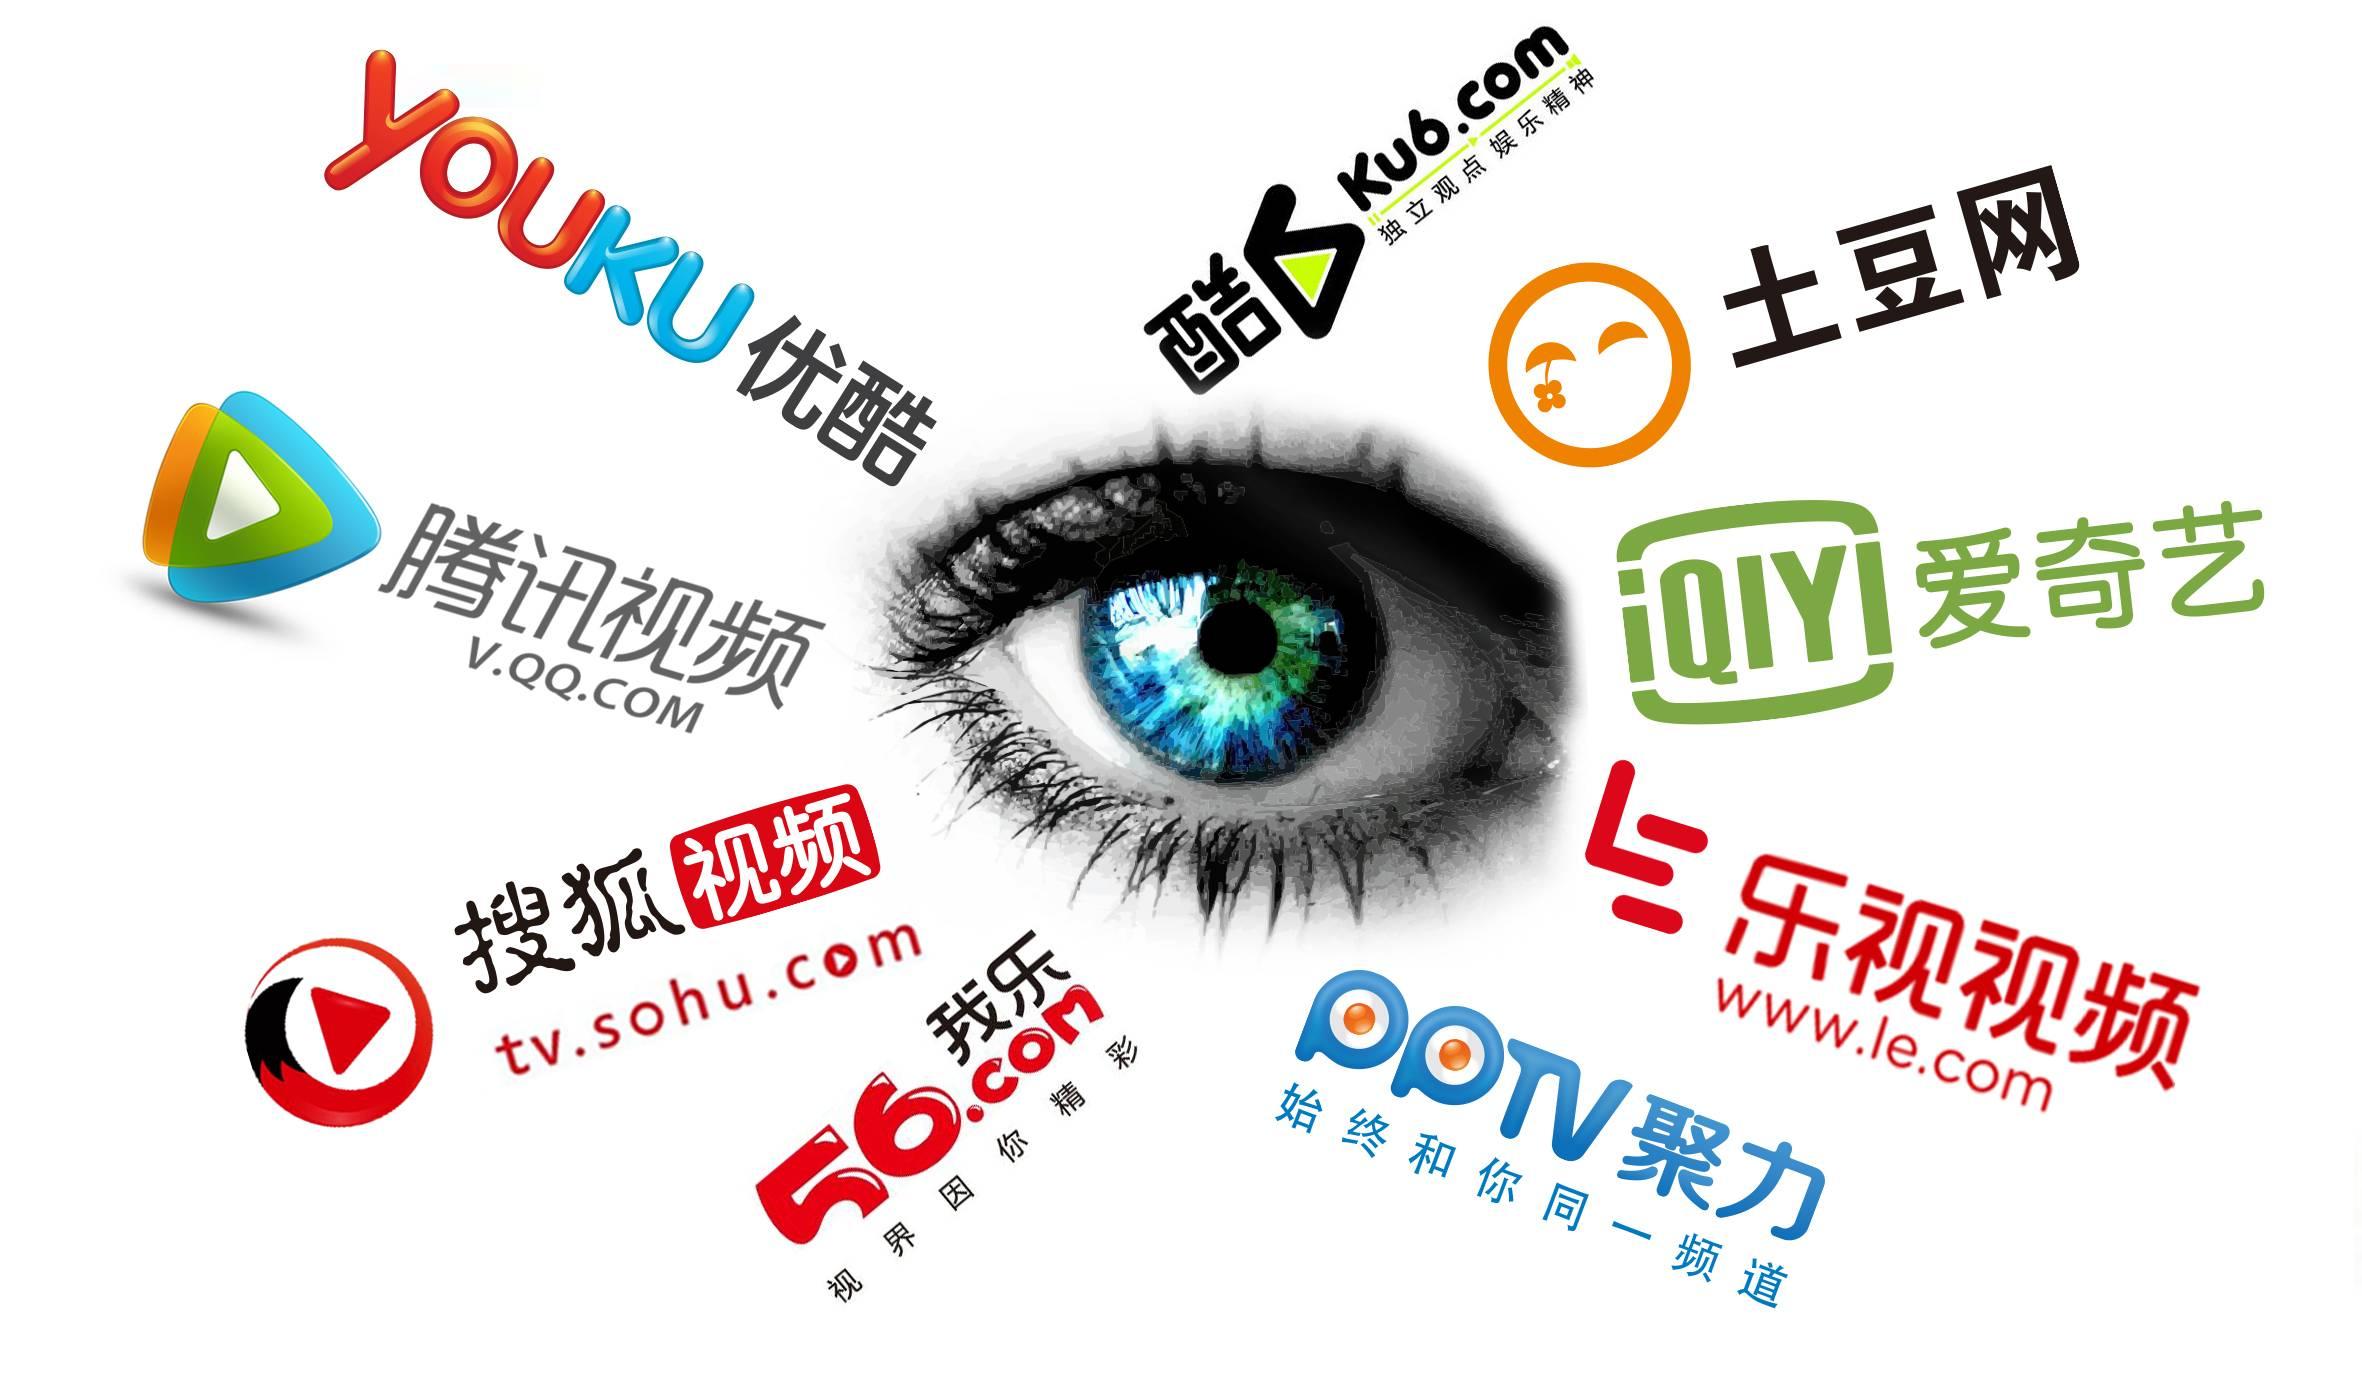 China video site